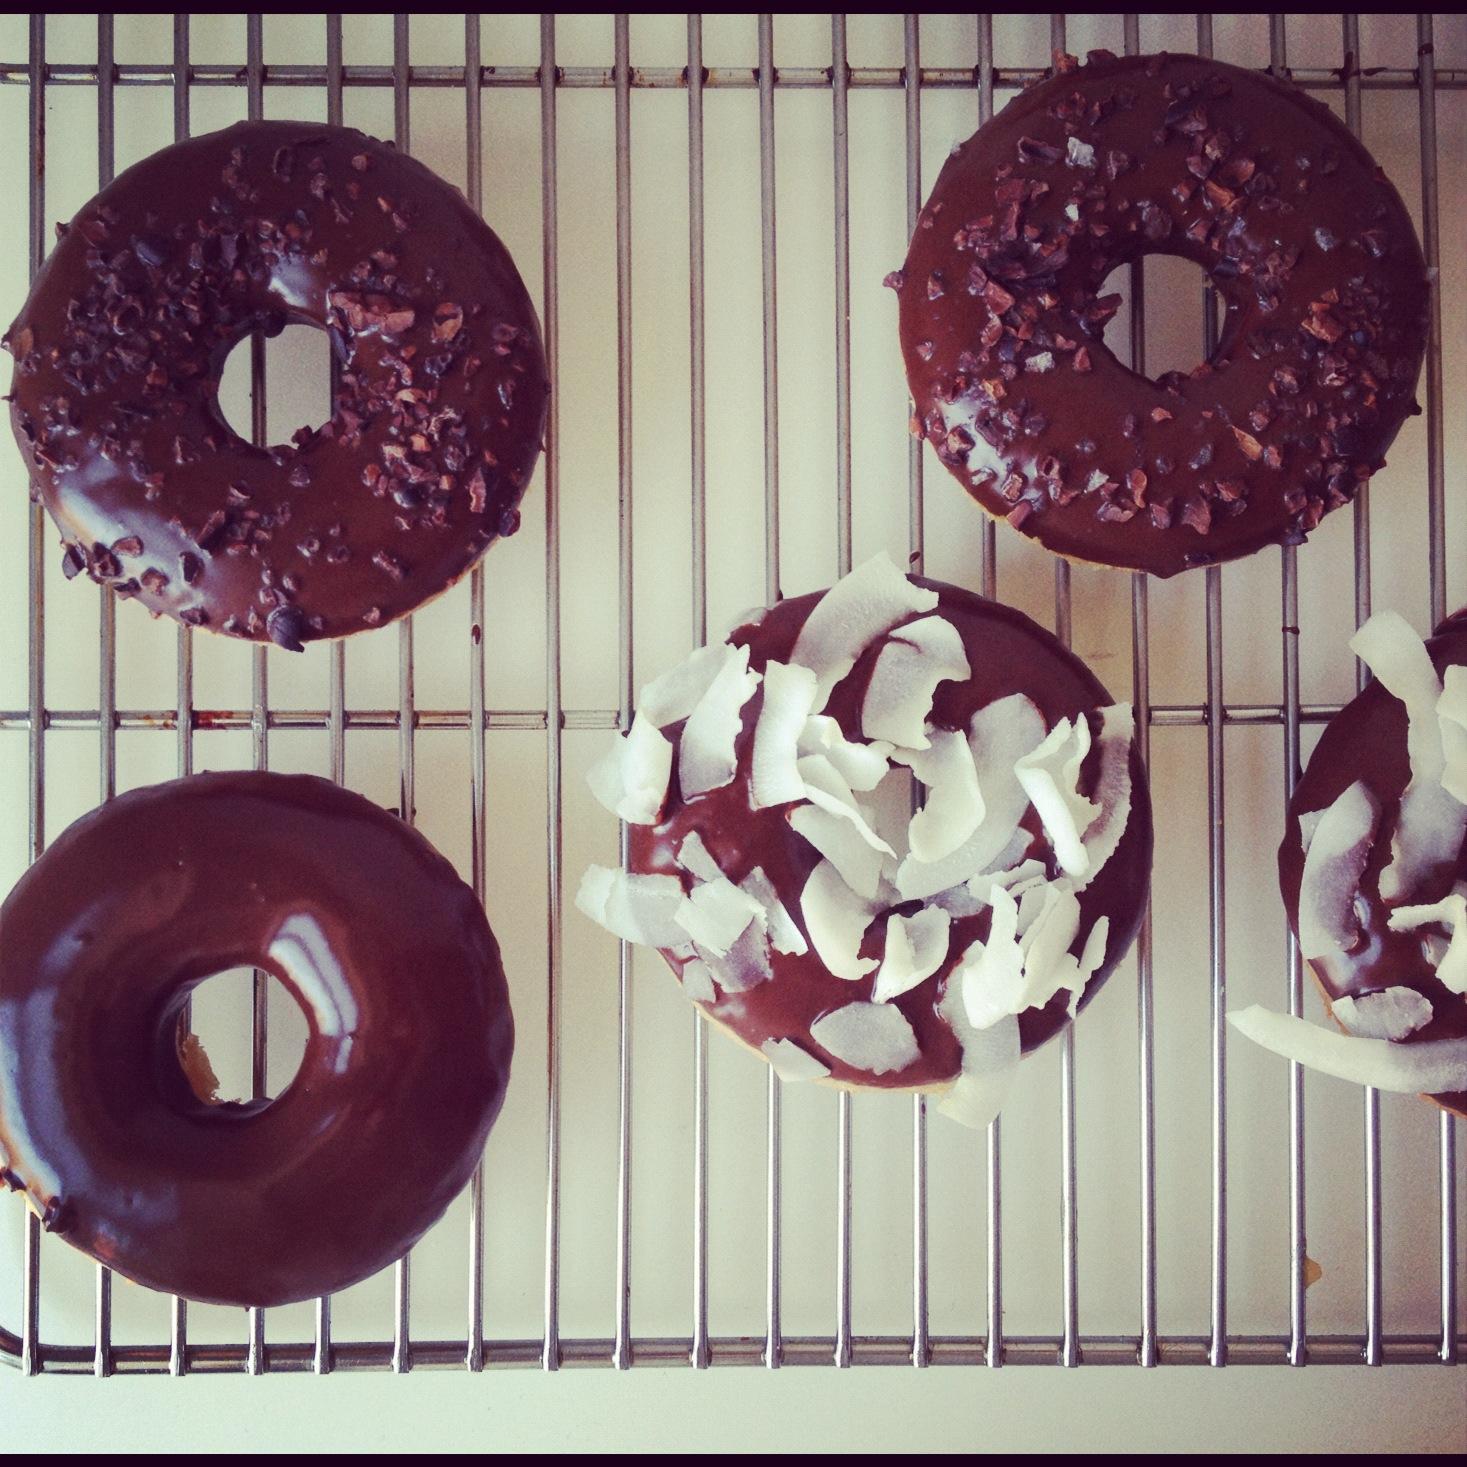 Gluten-free Donut Recipes